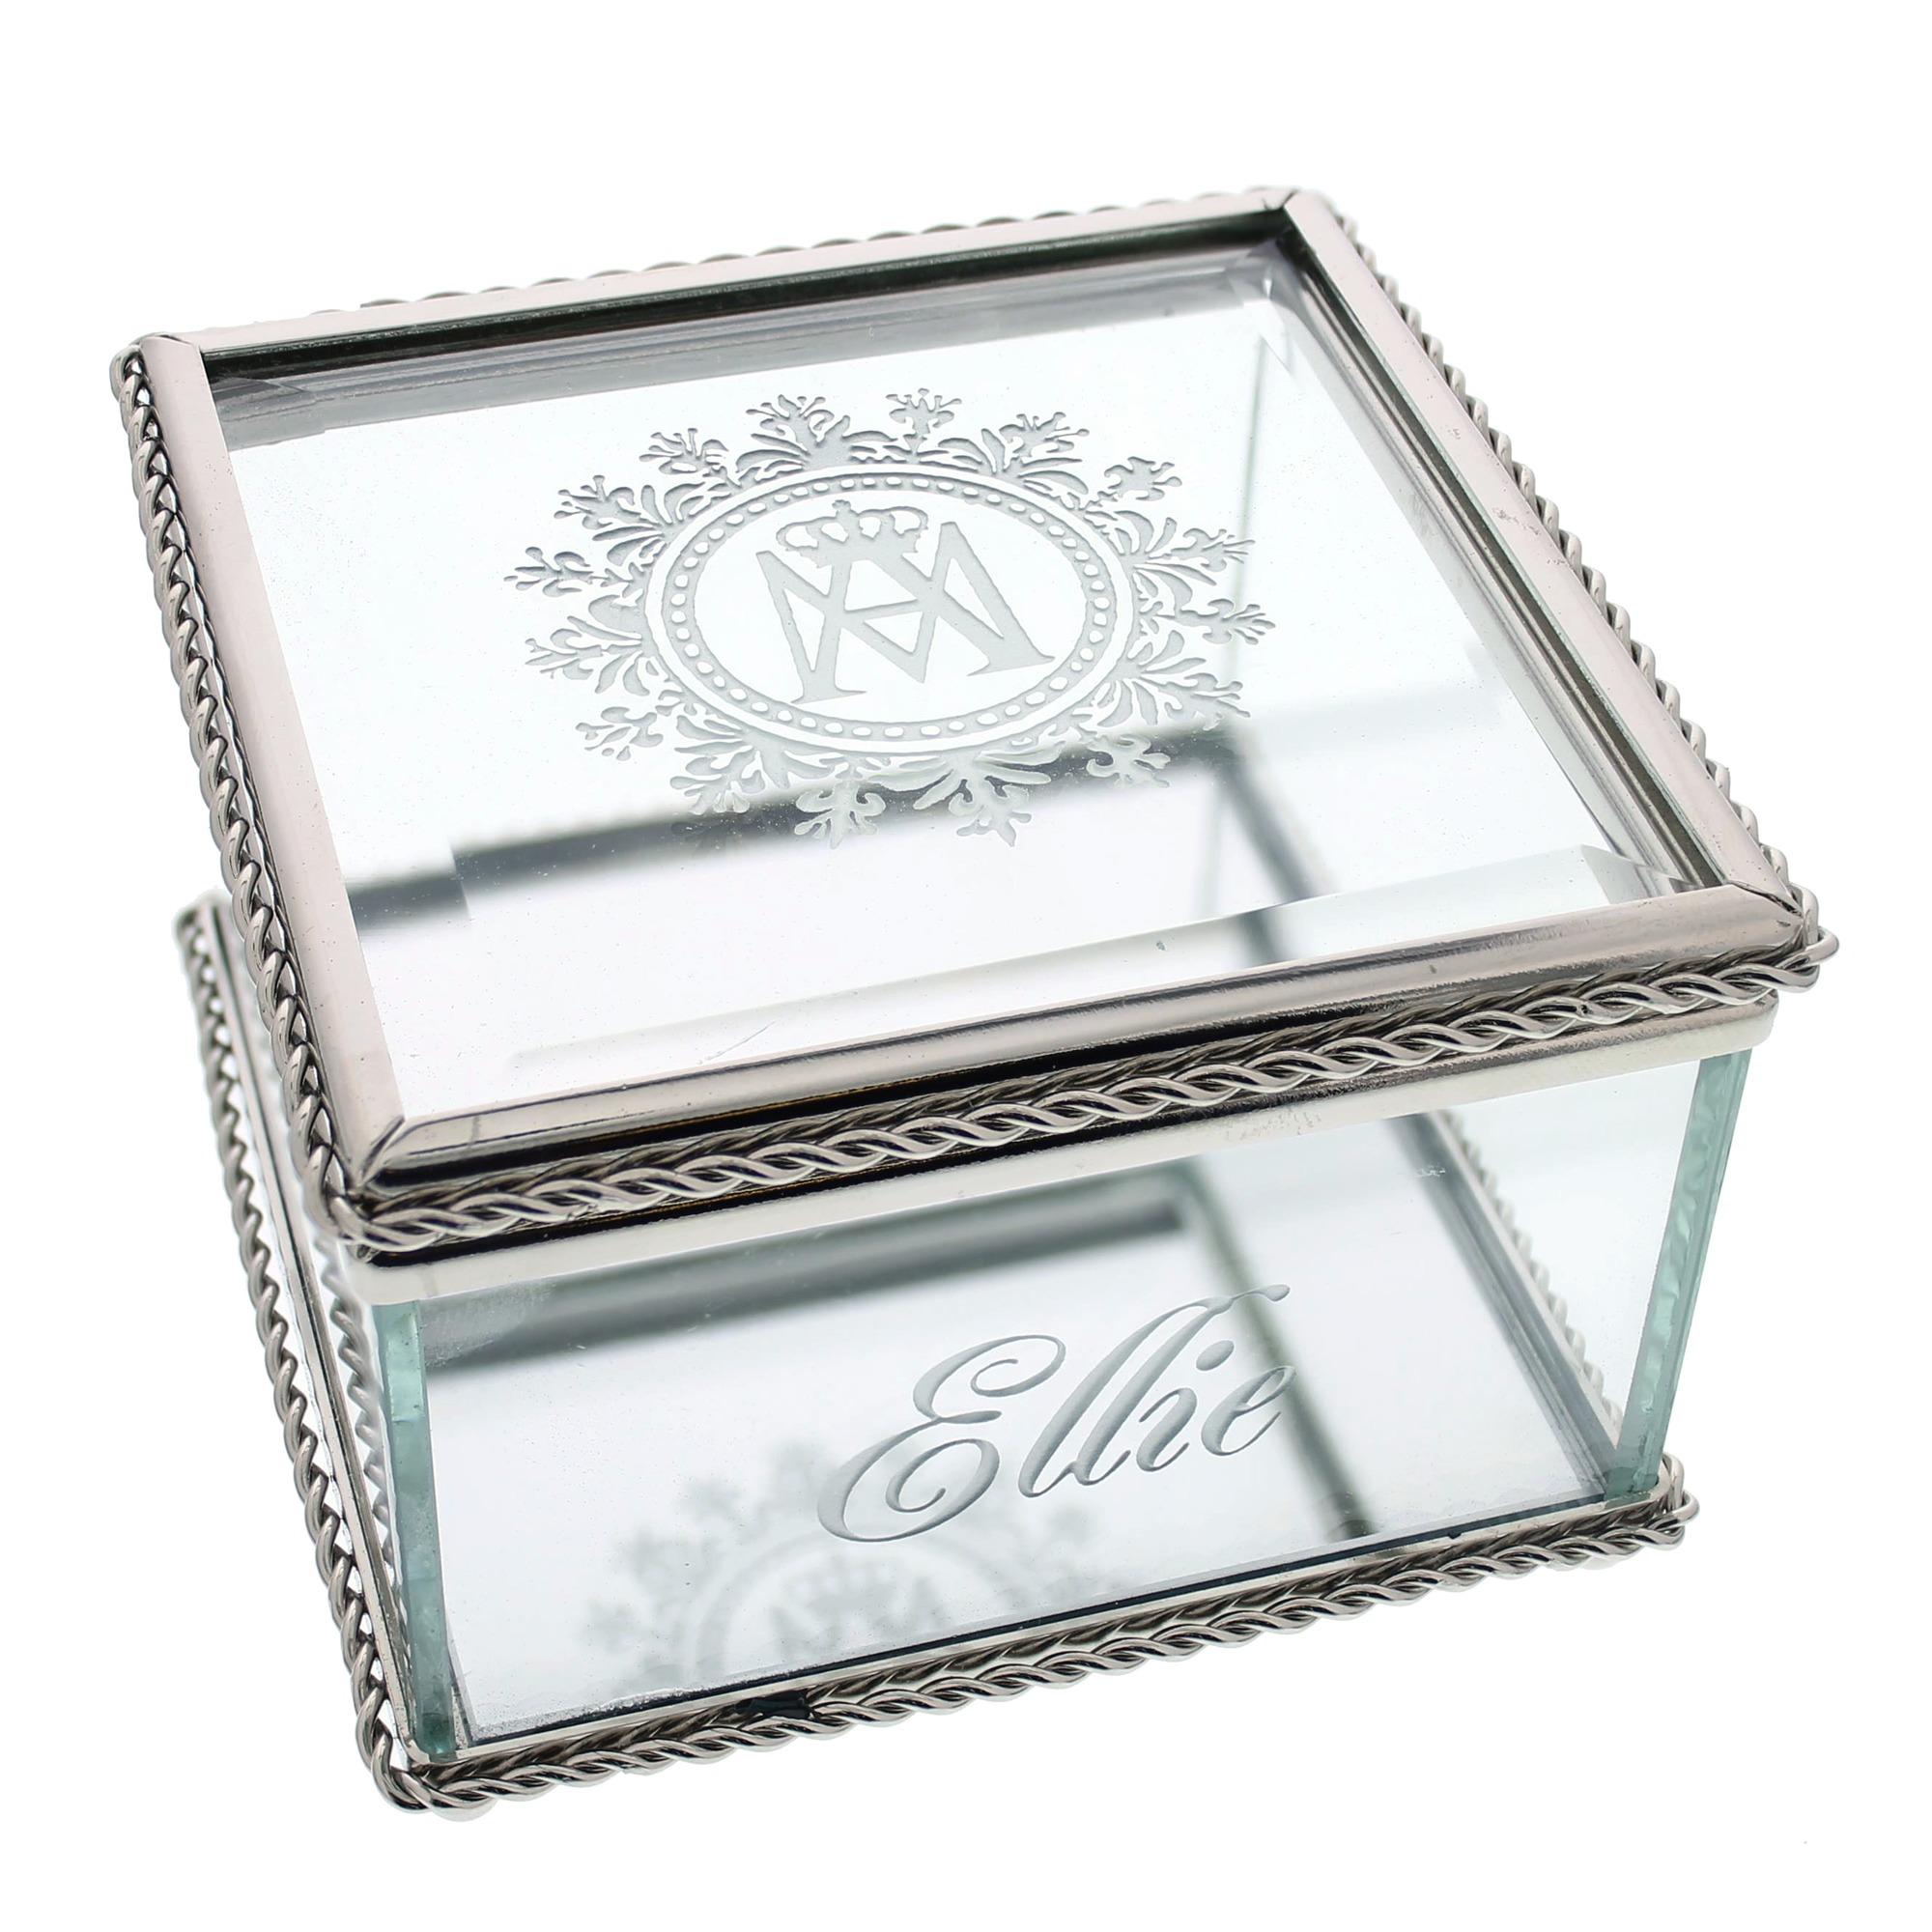 Ave Maria Glass Keepsake Box The Catholic Company